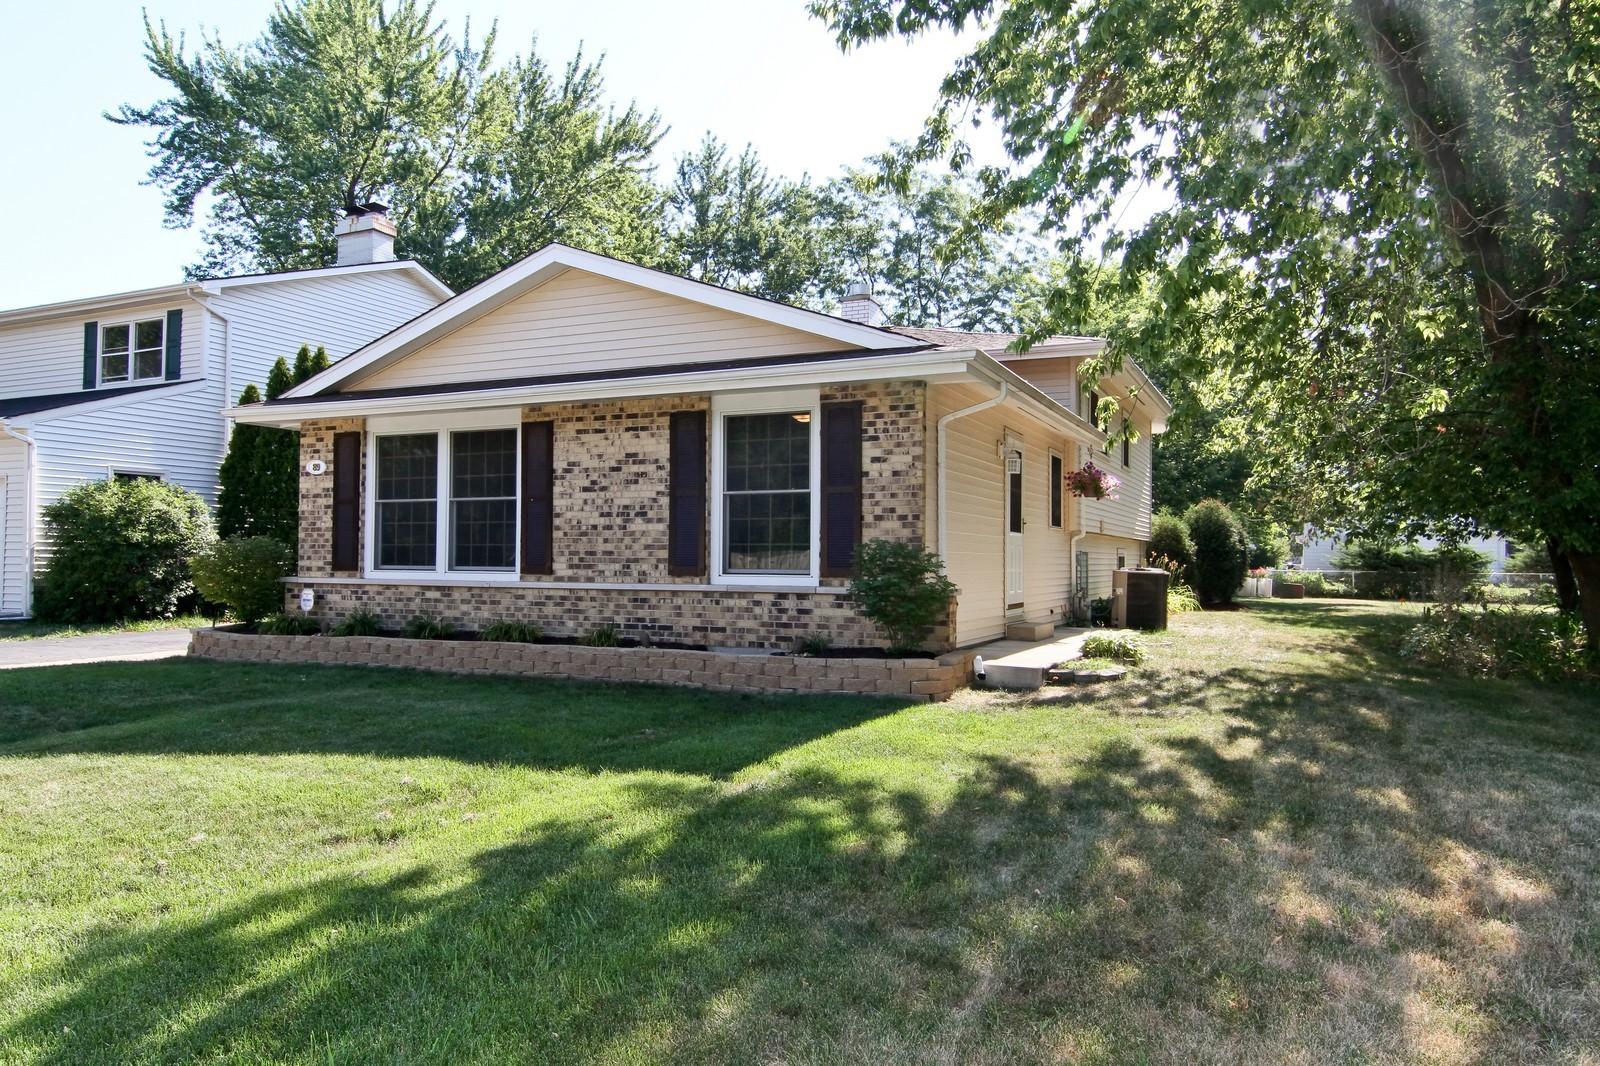 Real Estate Photography - 89 N Ott, Glen Ellyn, IL, 60137 - Front View